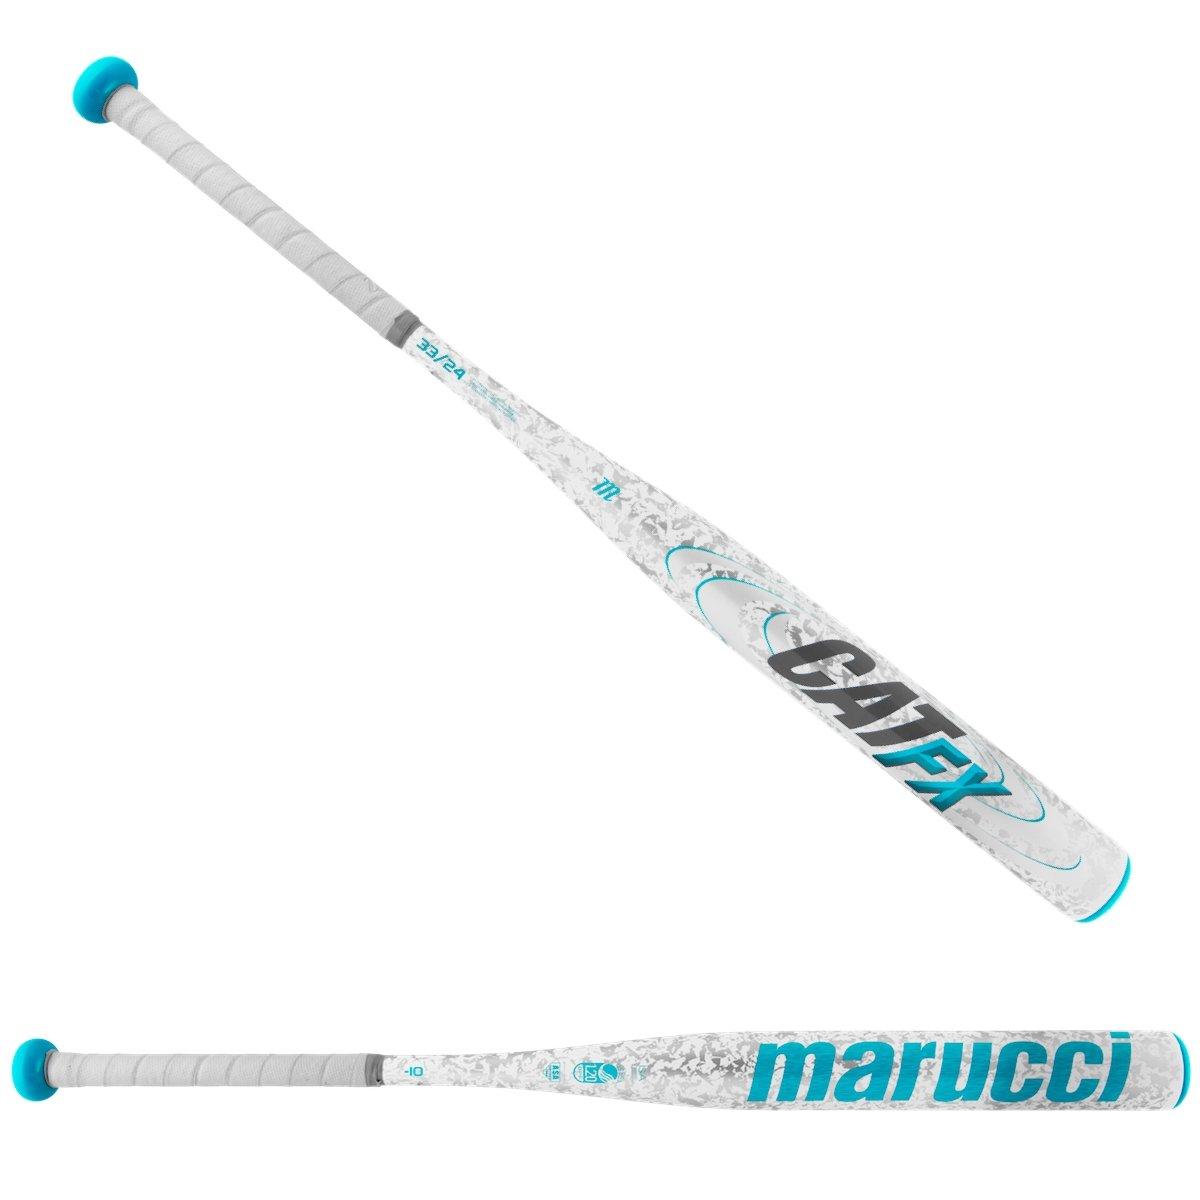 Marucci mfpc710 B0757MNRJ9 33 inch/23 oz